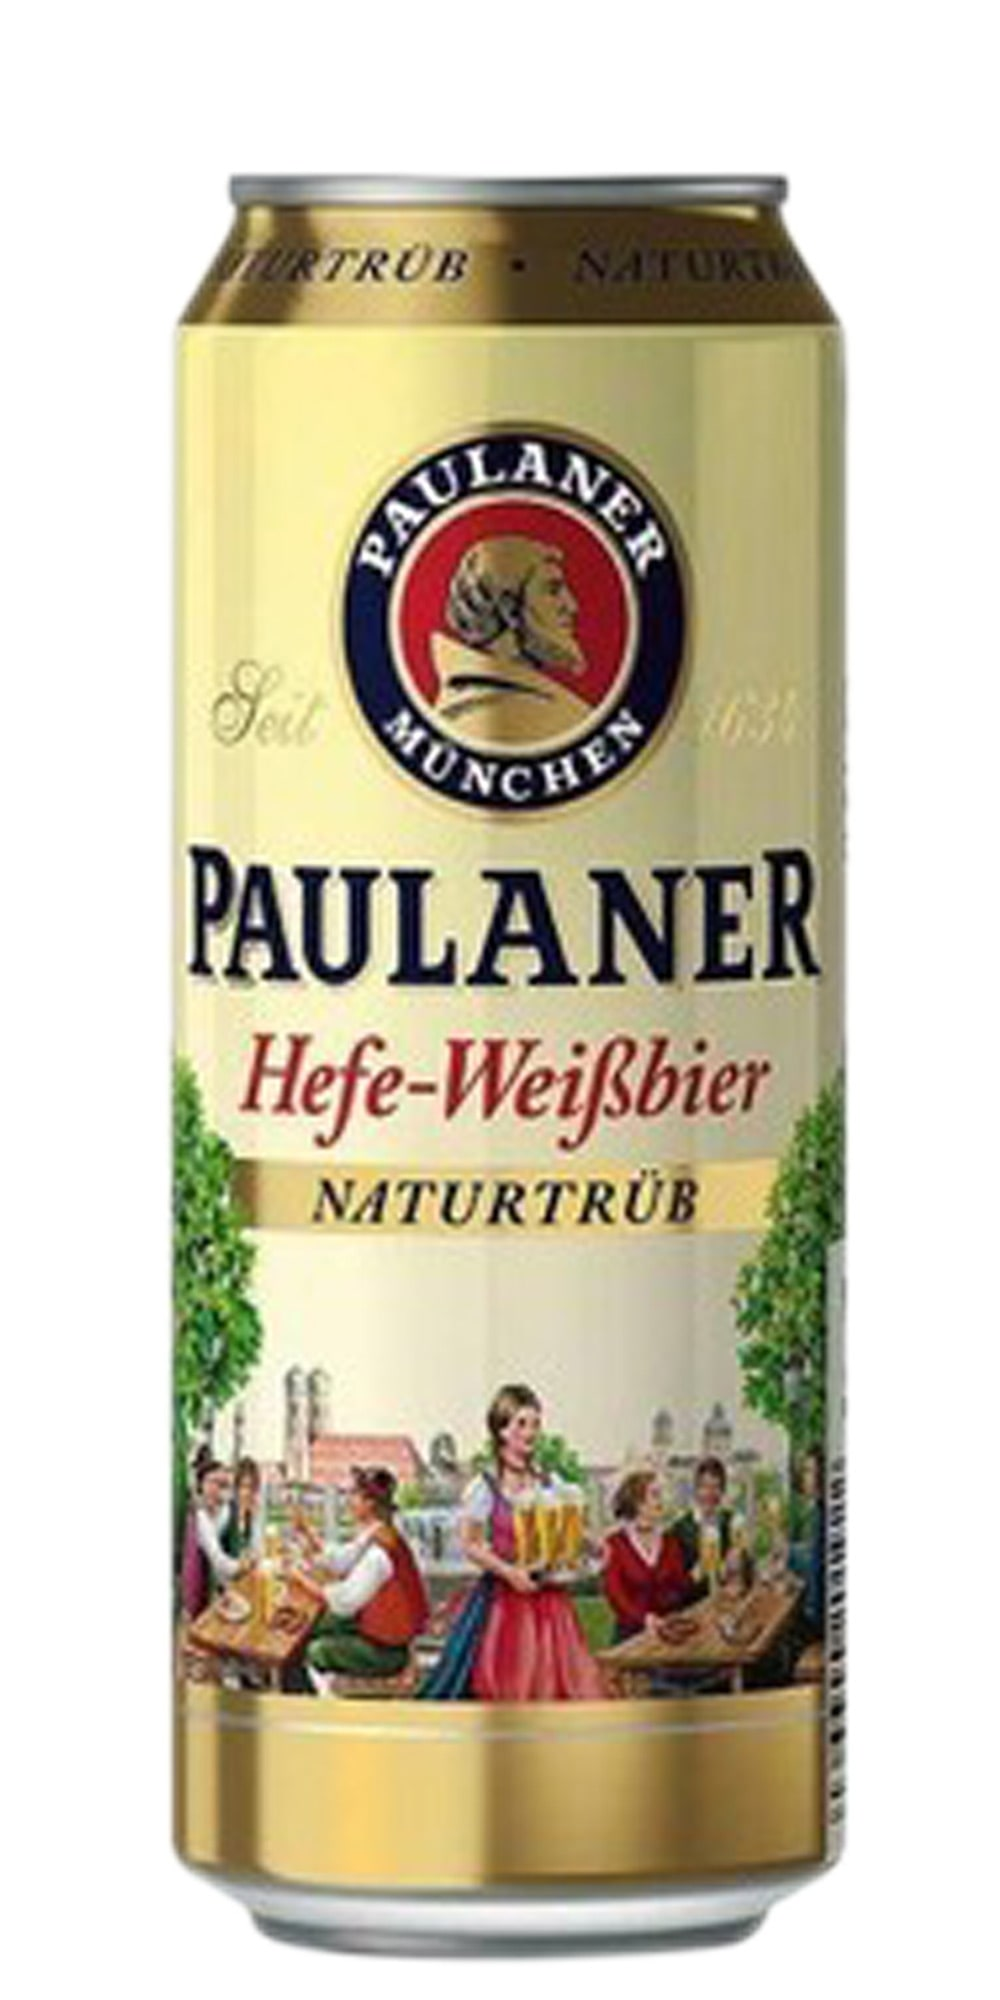 CERVEJA PAULANER HEFE WEISSBIER NATURTRUB (LATA) 500 ML